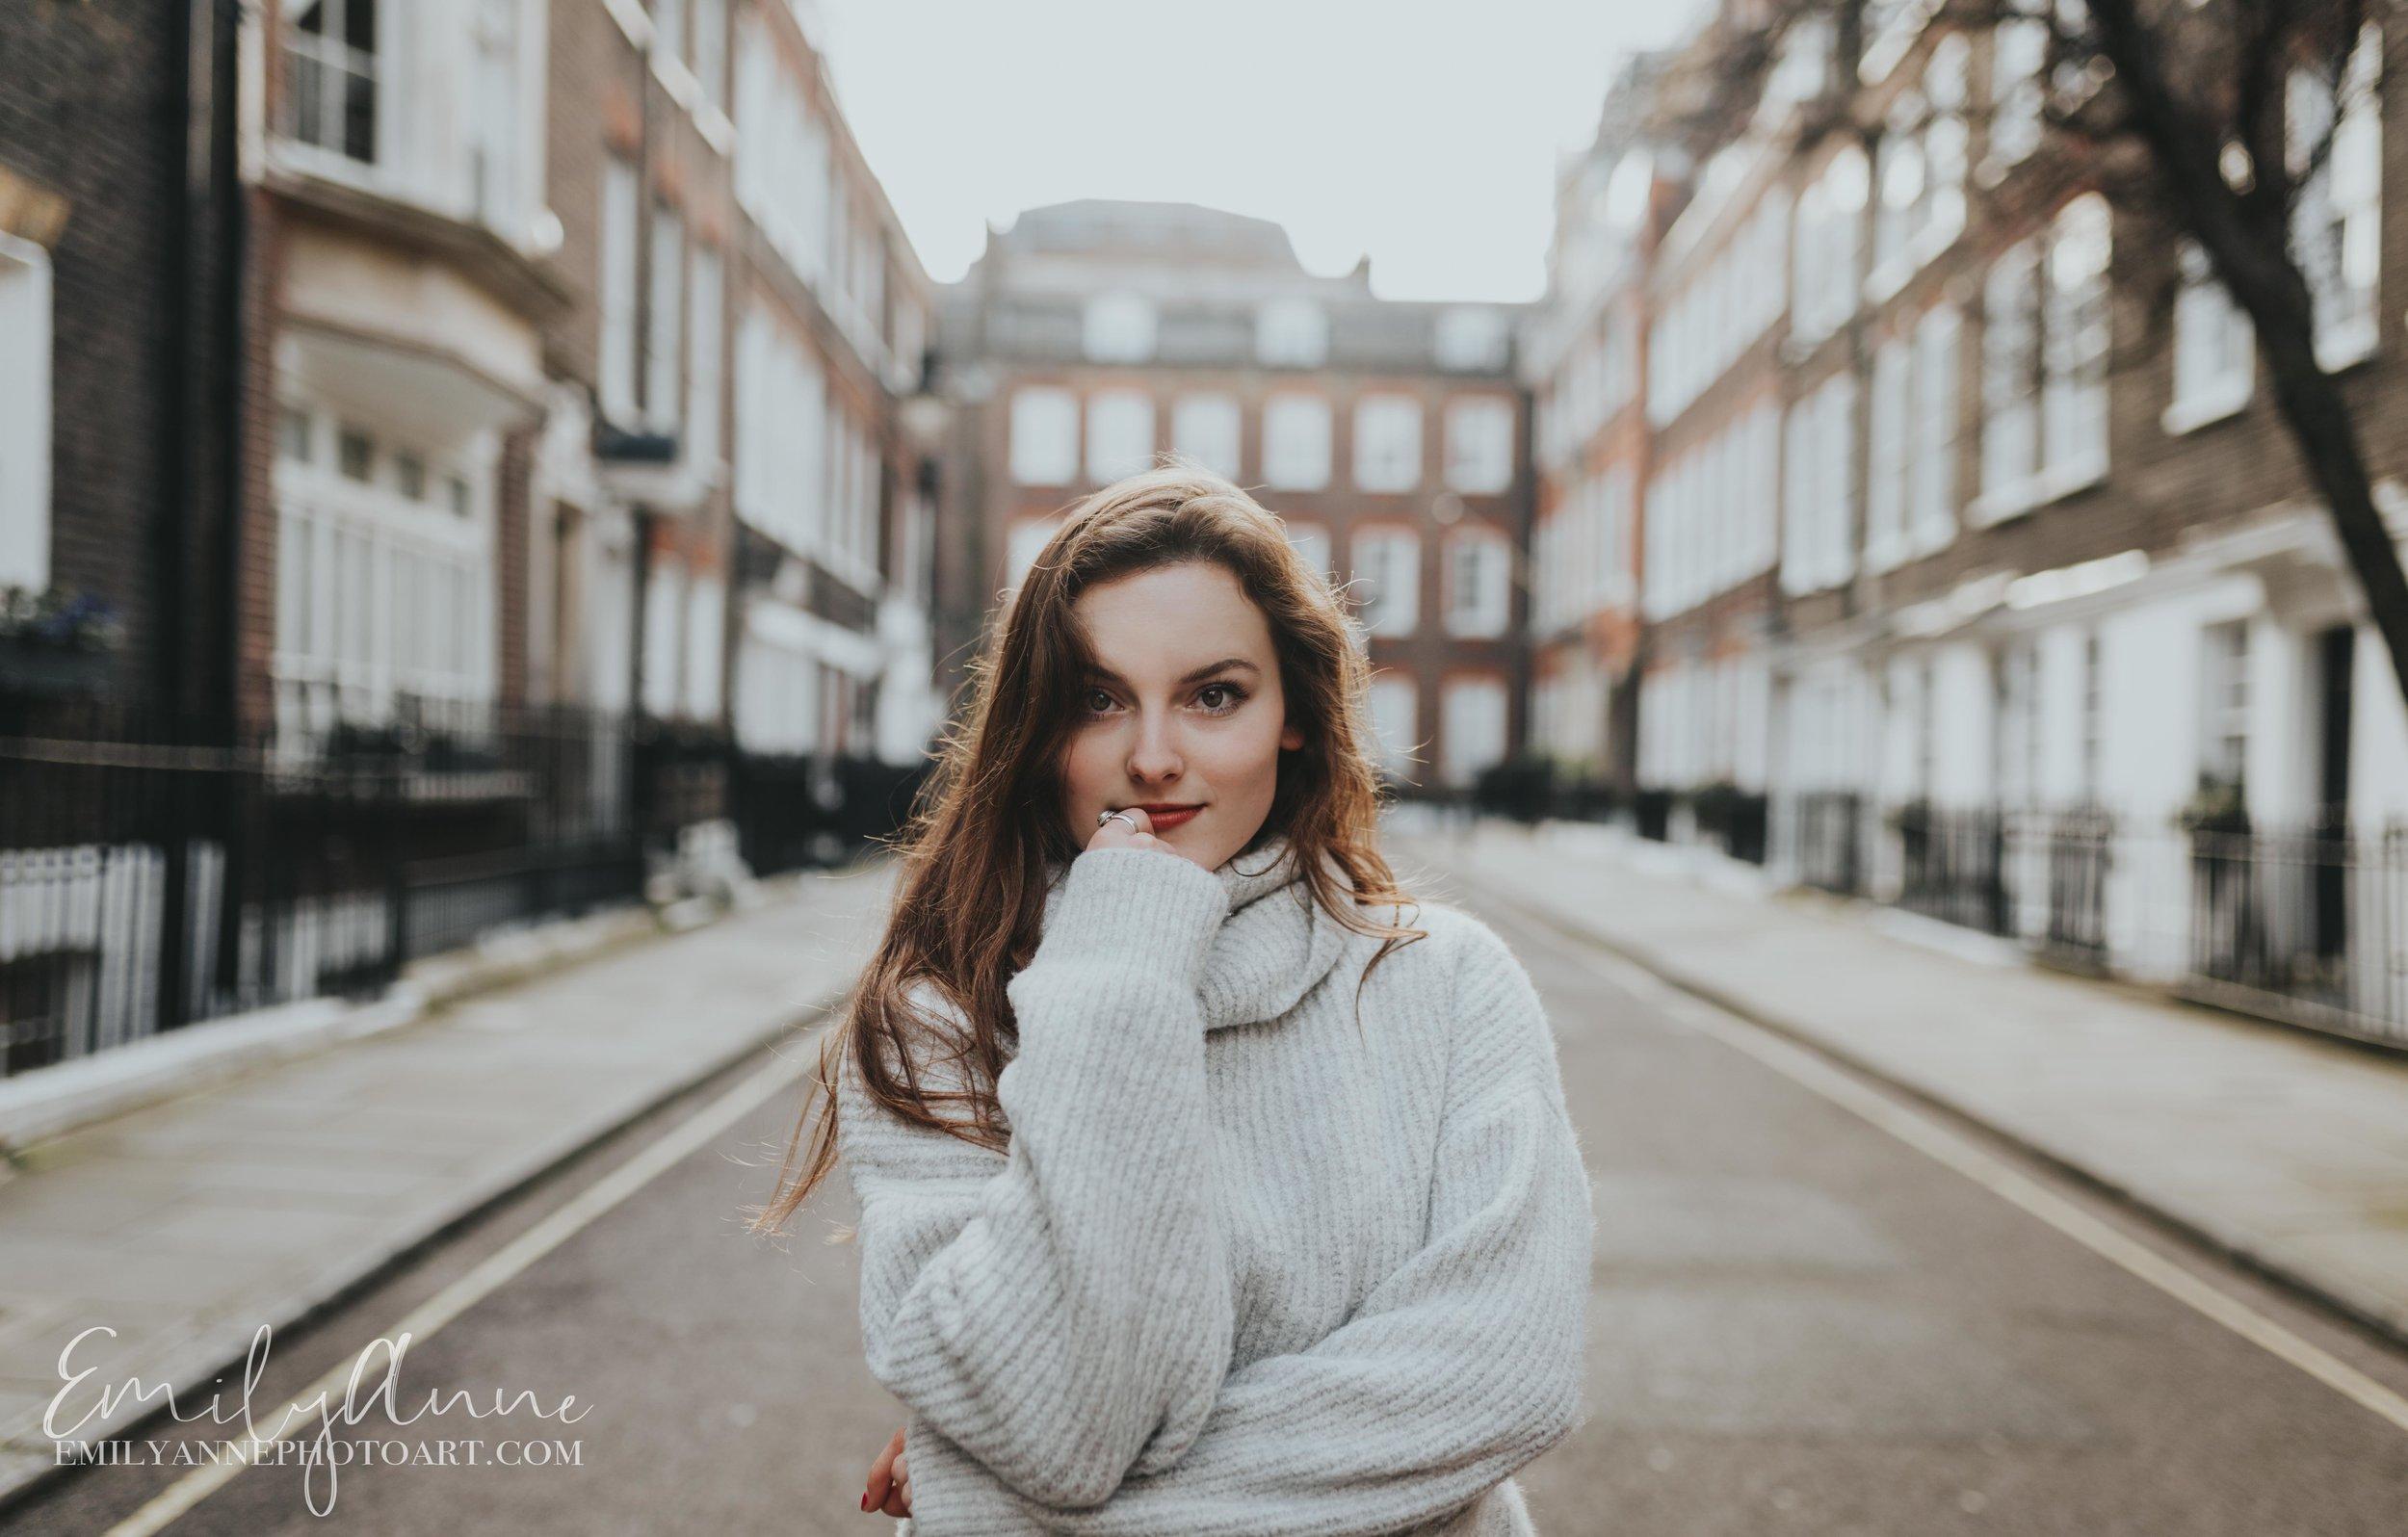 gorgeous inspirational shoot Emily Anne Photography Nashville/Barclelona/London Photographer best portrait award